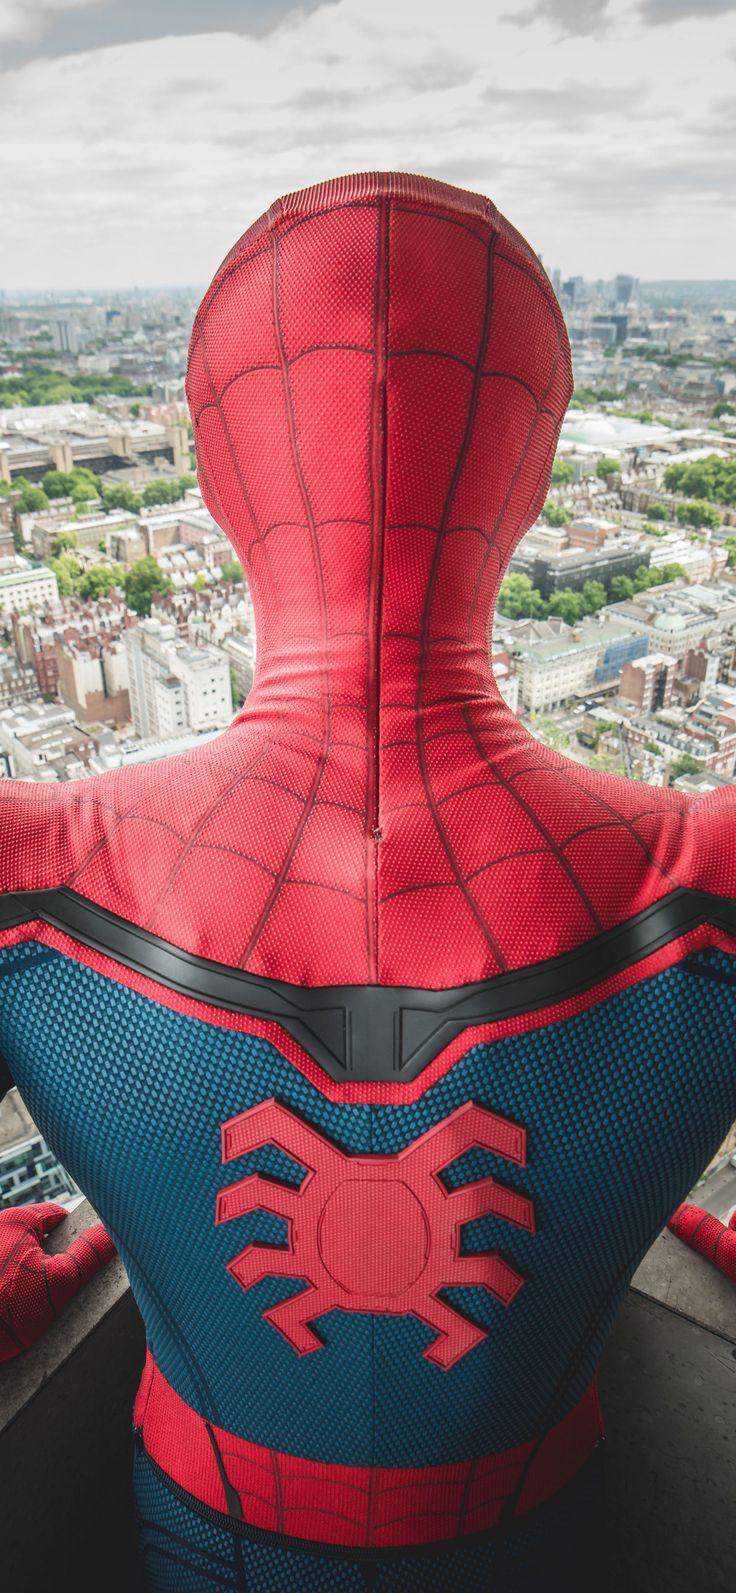 1125x2436 Spiderman 4k 8k Iphone XS,Iphone 10